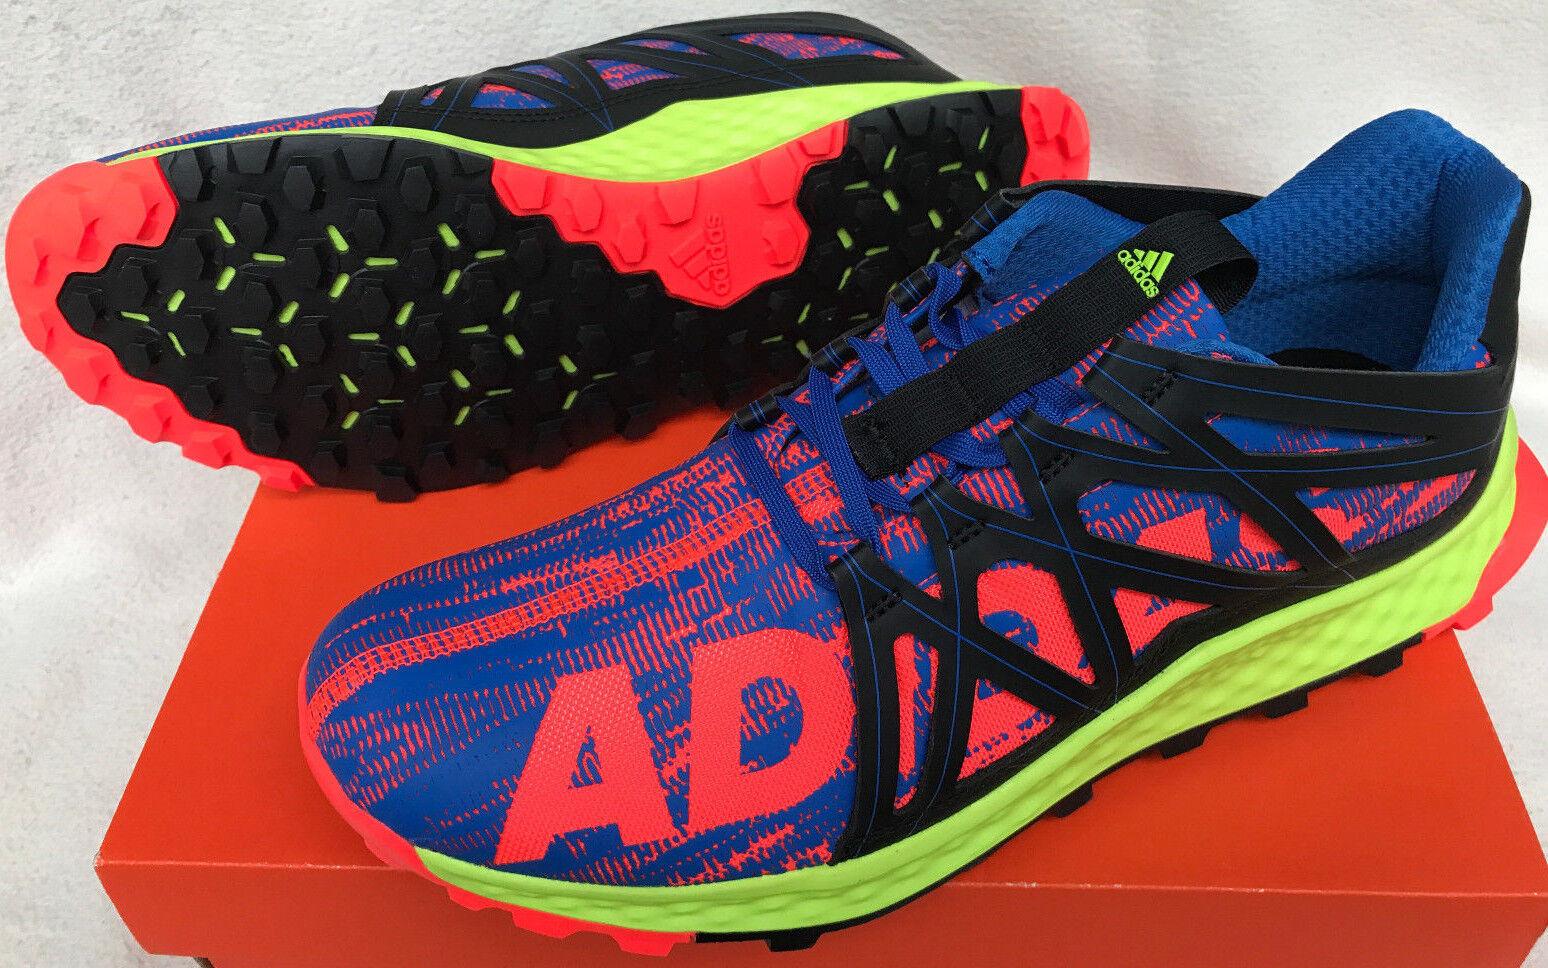 Adidas Vigor Bounce M Trail AQ7513 Bright Marathon Running Shoes Men's 10.5 new